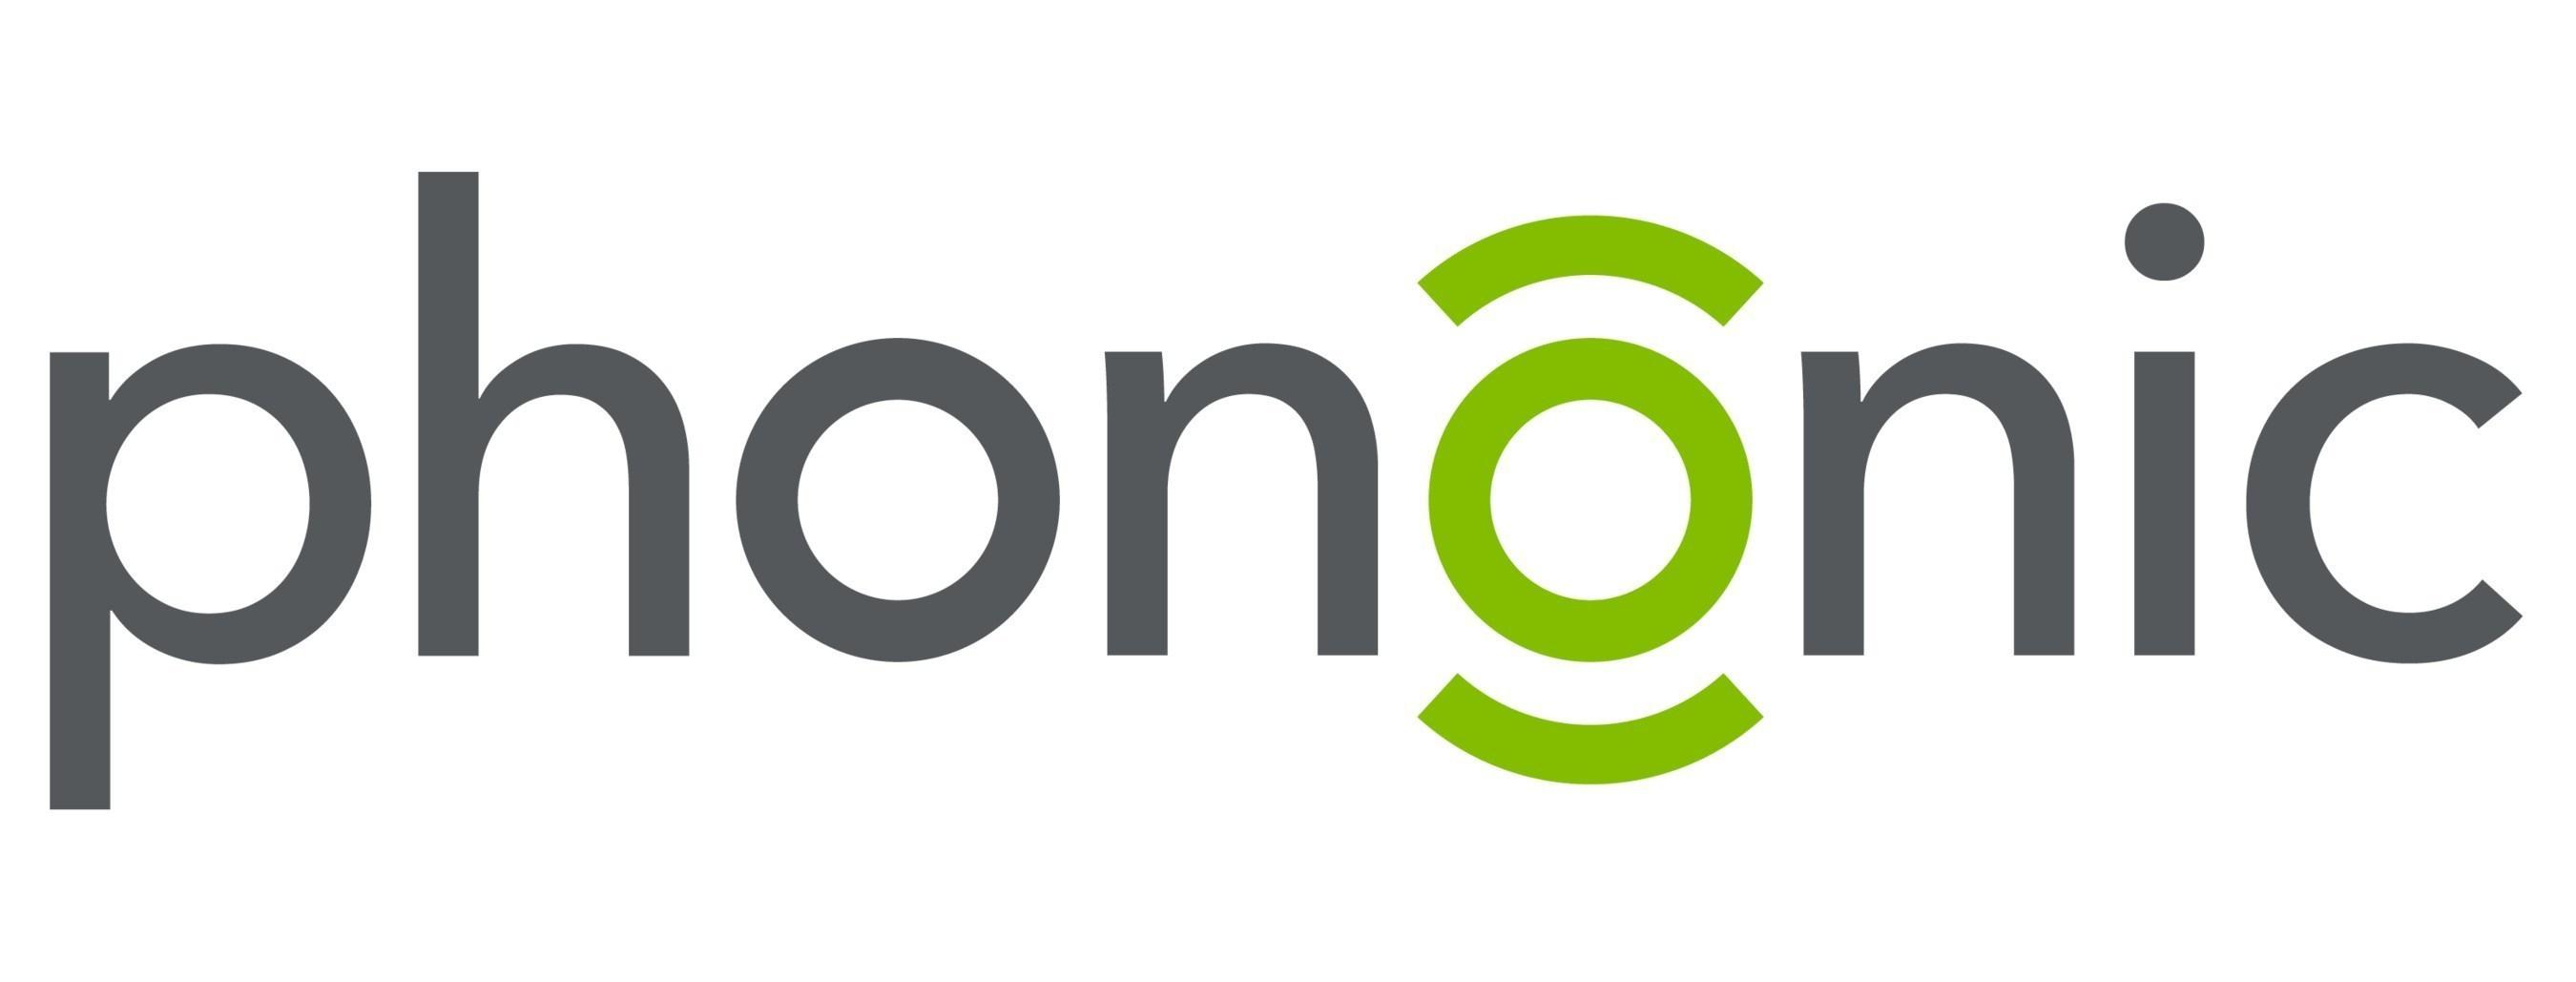 Phononic logo